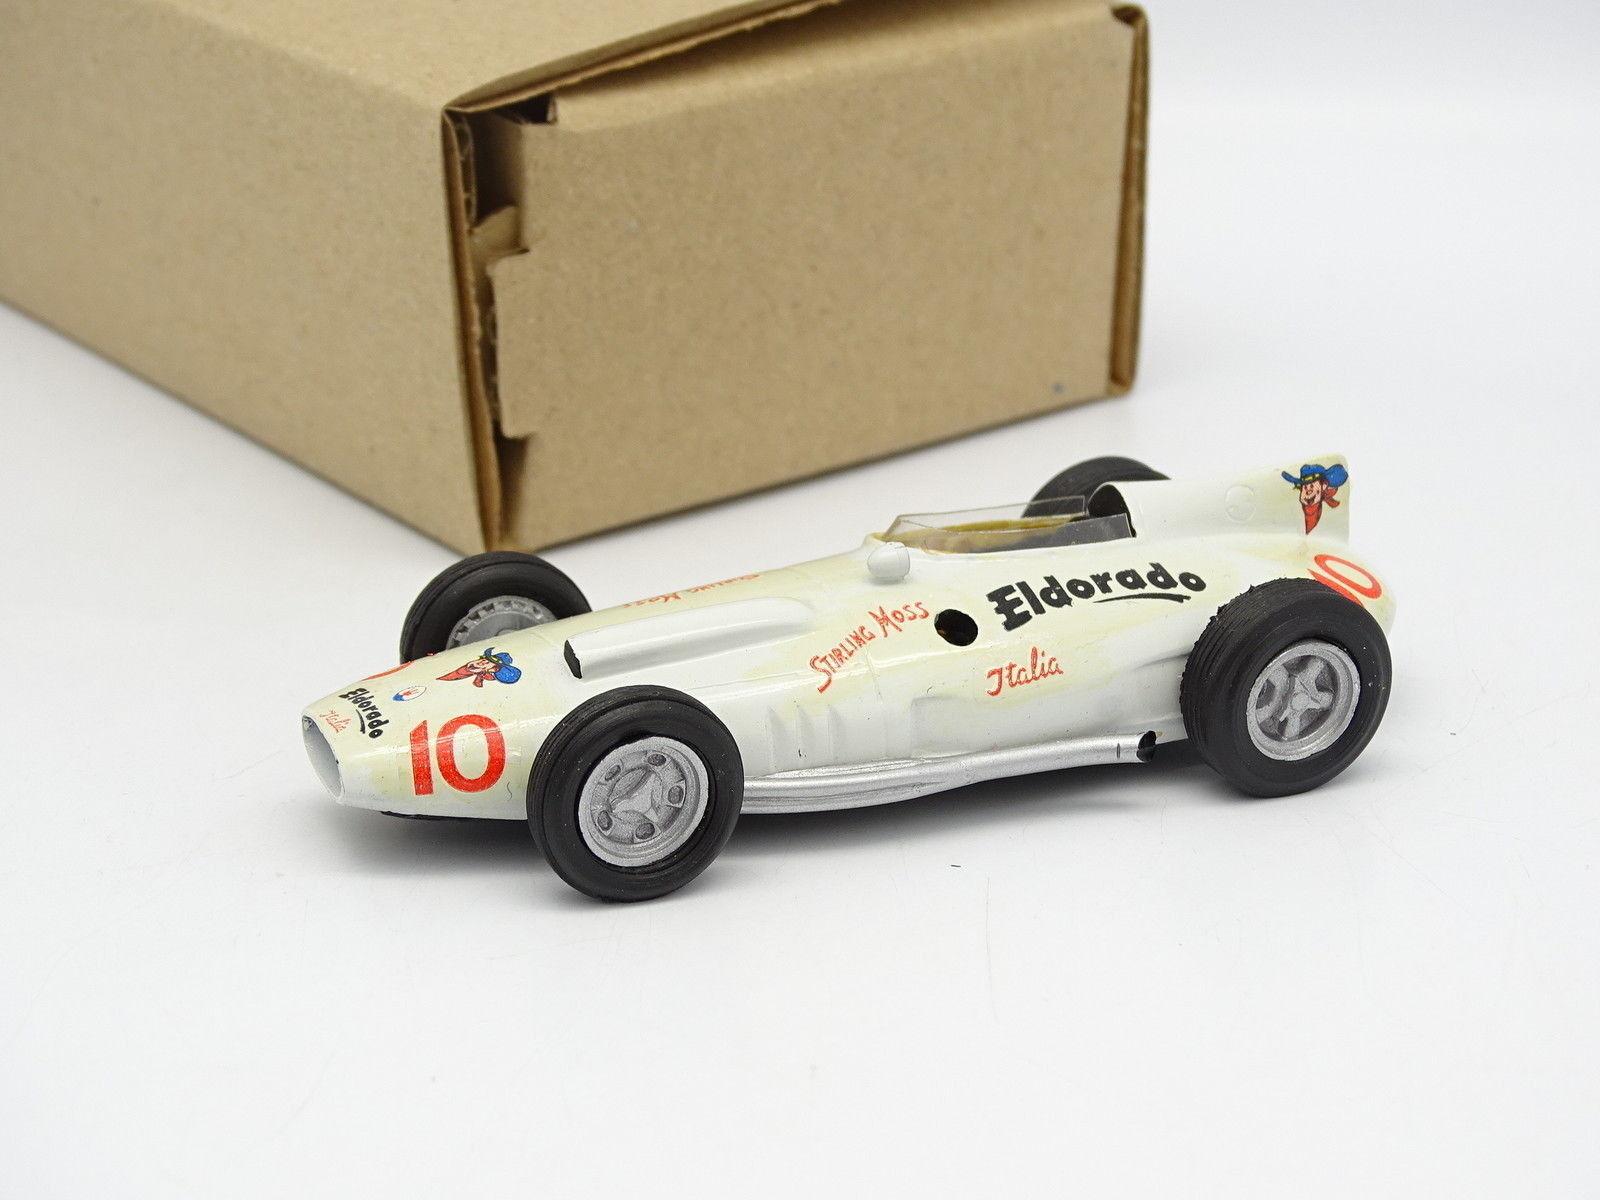 AutoStile Brianza Kit monté SB 1 43 - Maserati F1 Eldorado Monza GP 1958